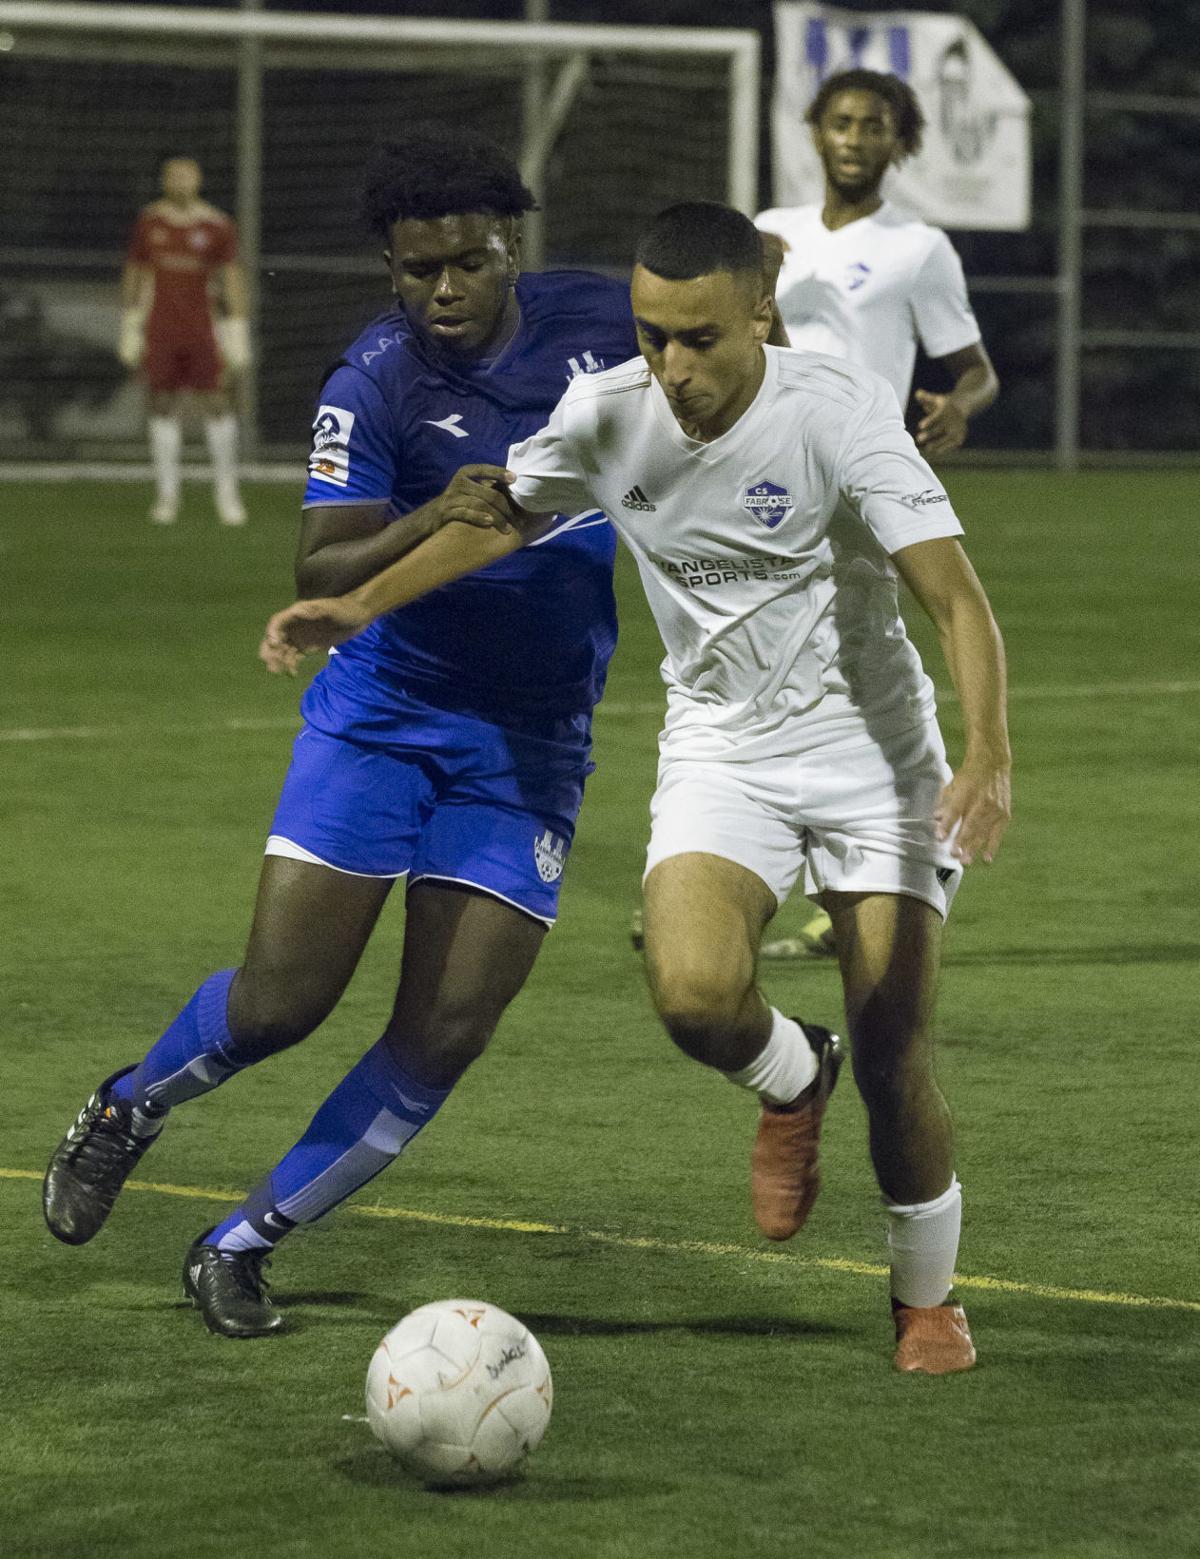 Fabrose shuts down Pierrefonds in U21M AAA play